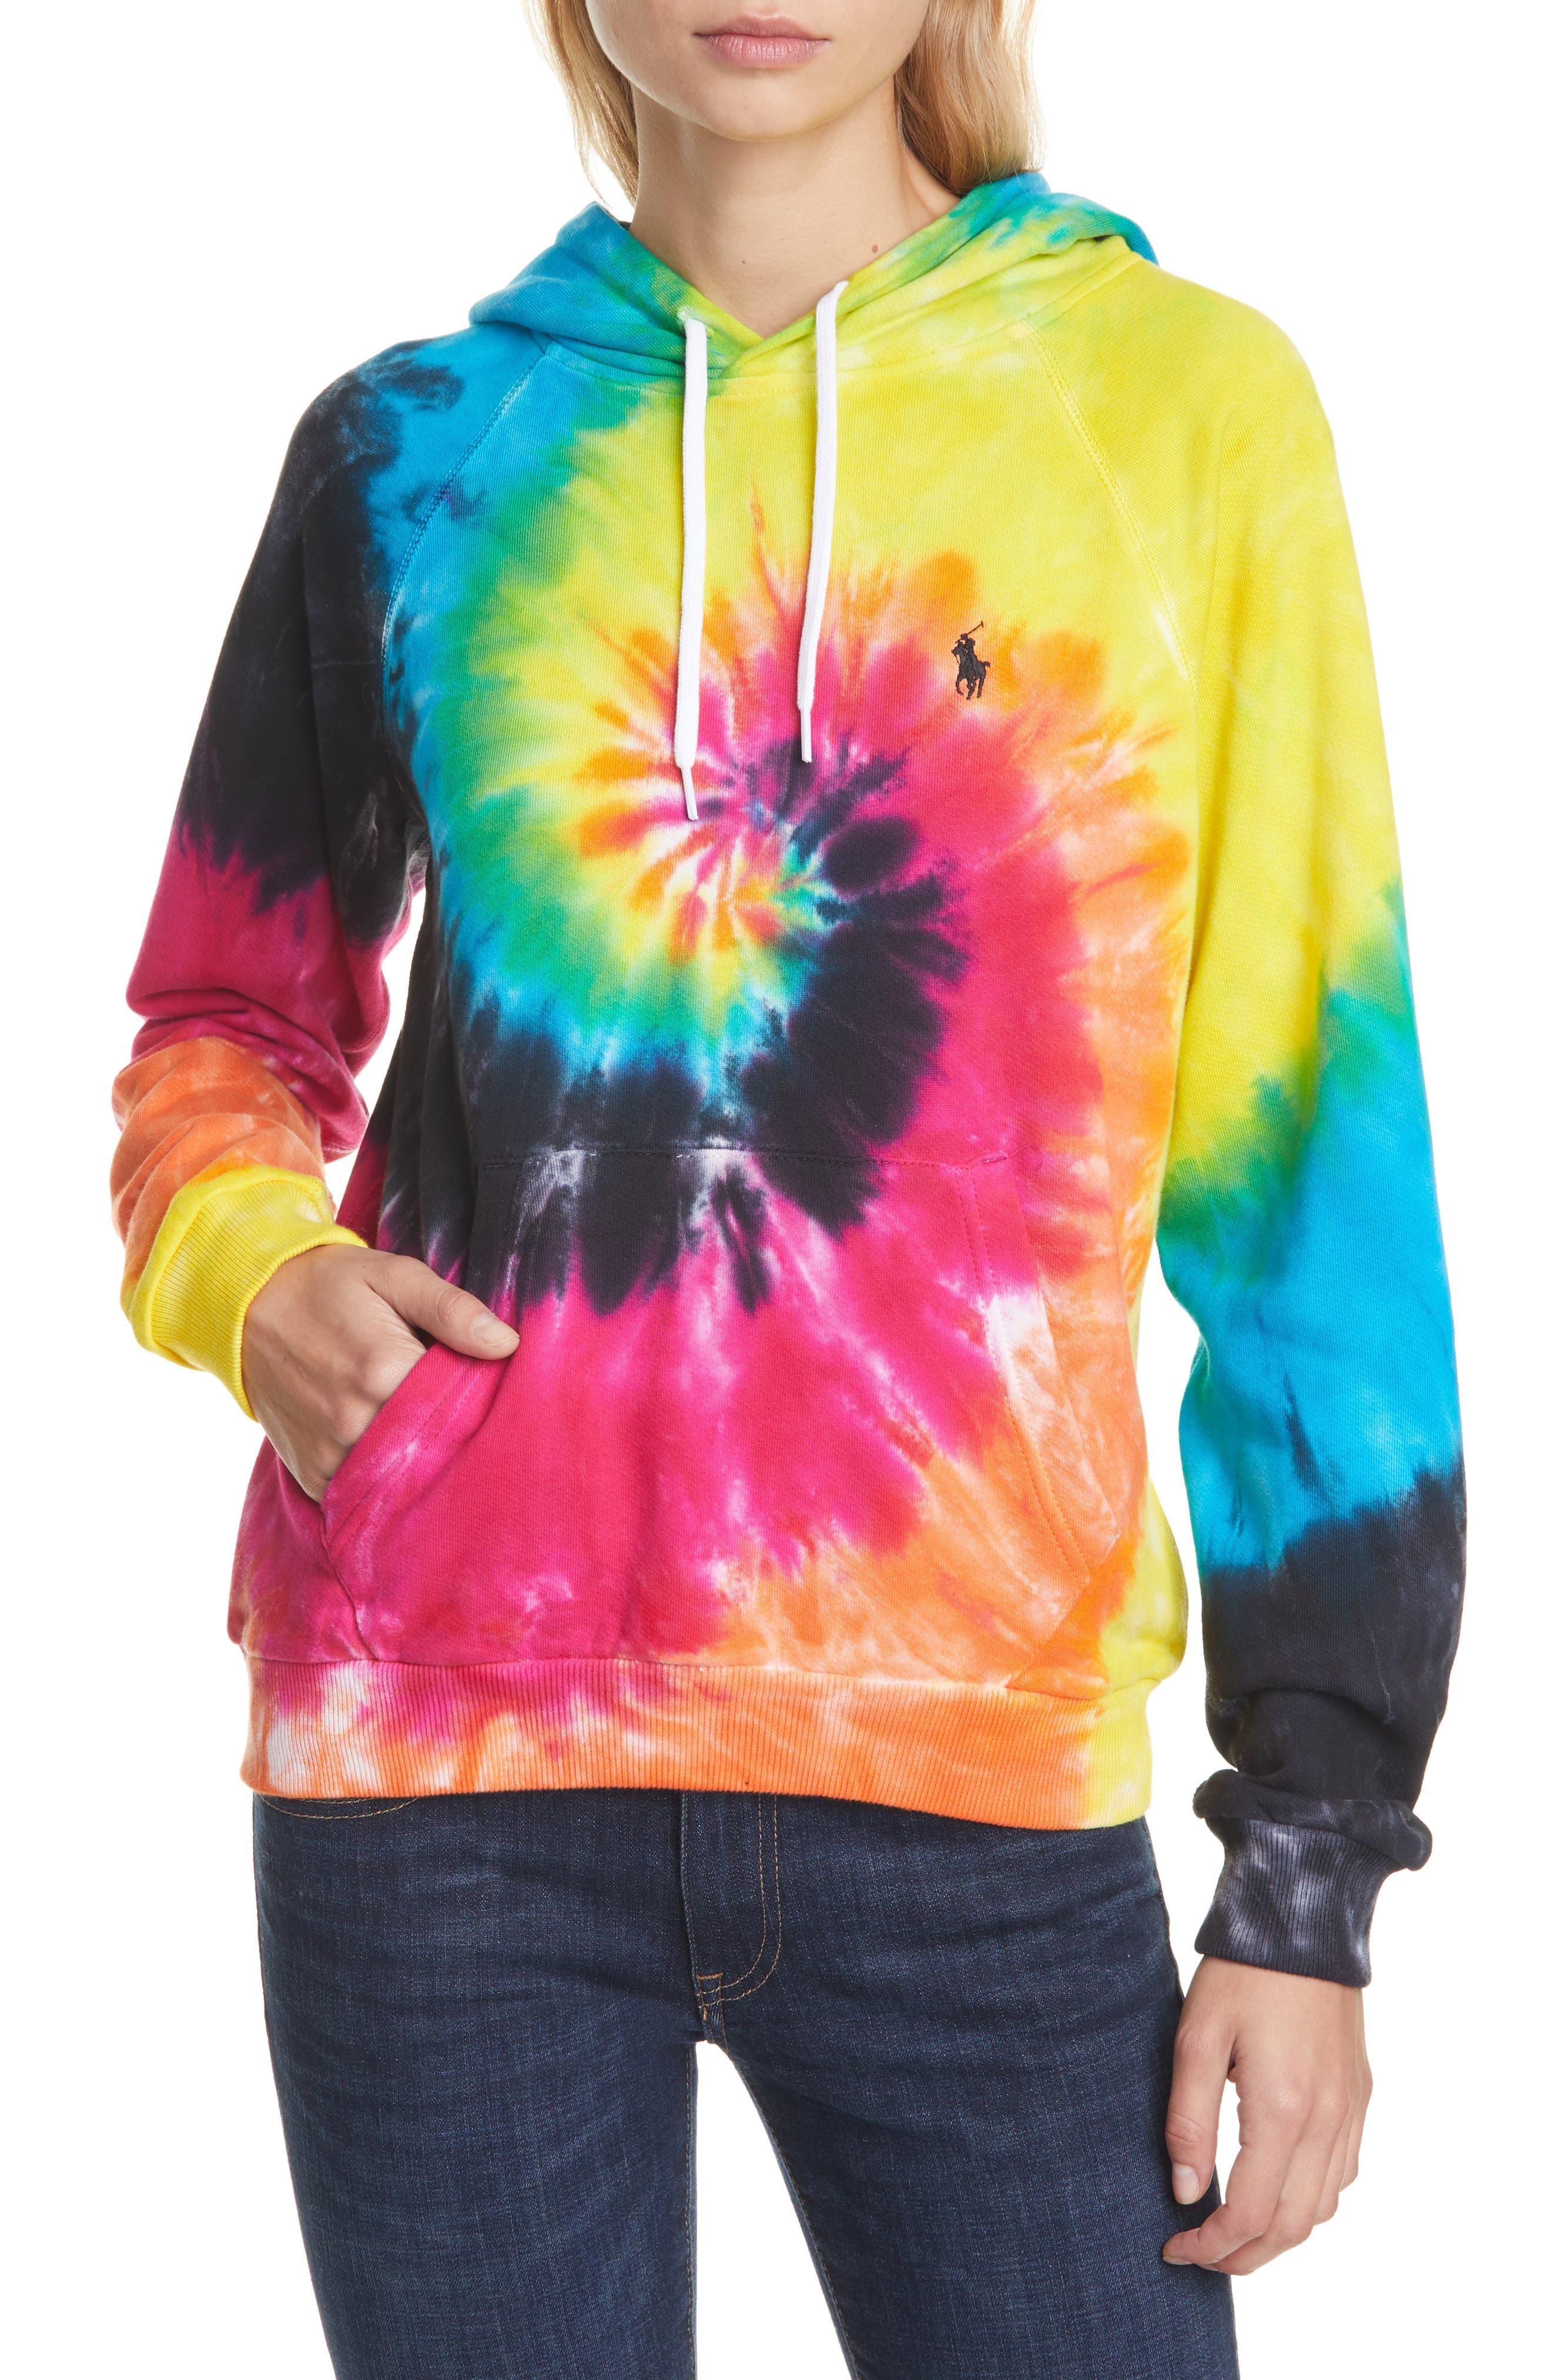 Women's Sweatshirts & Hoodies Polo Ralph Lauren Clothing